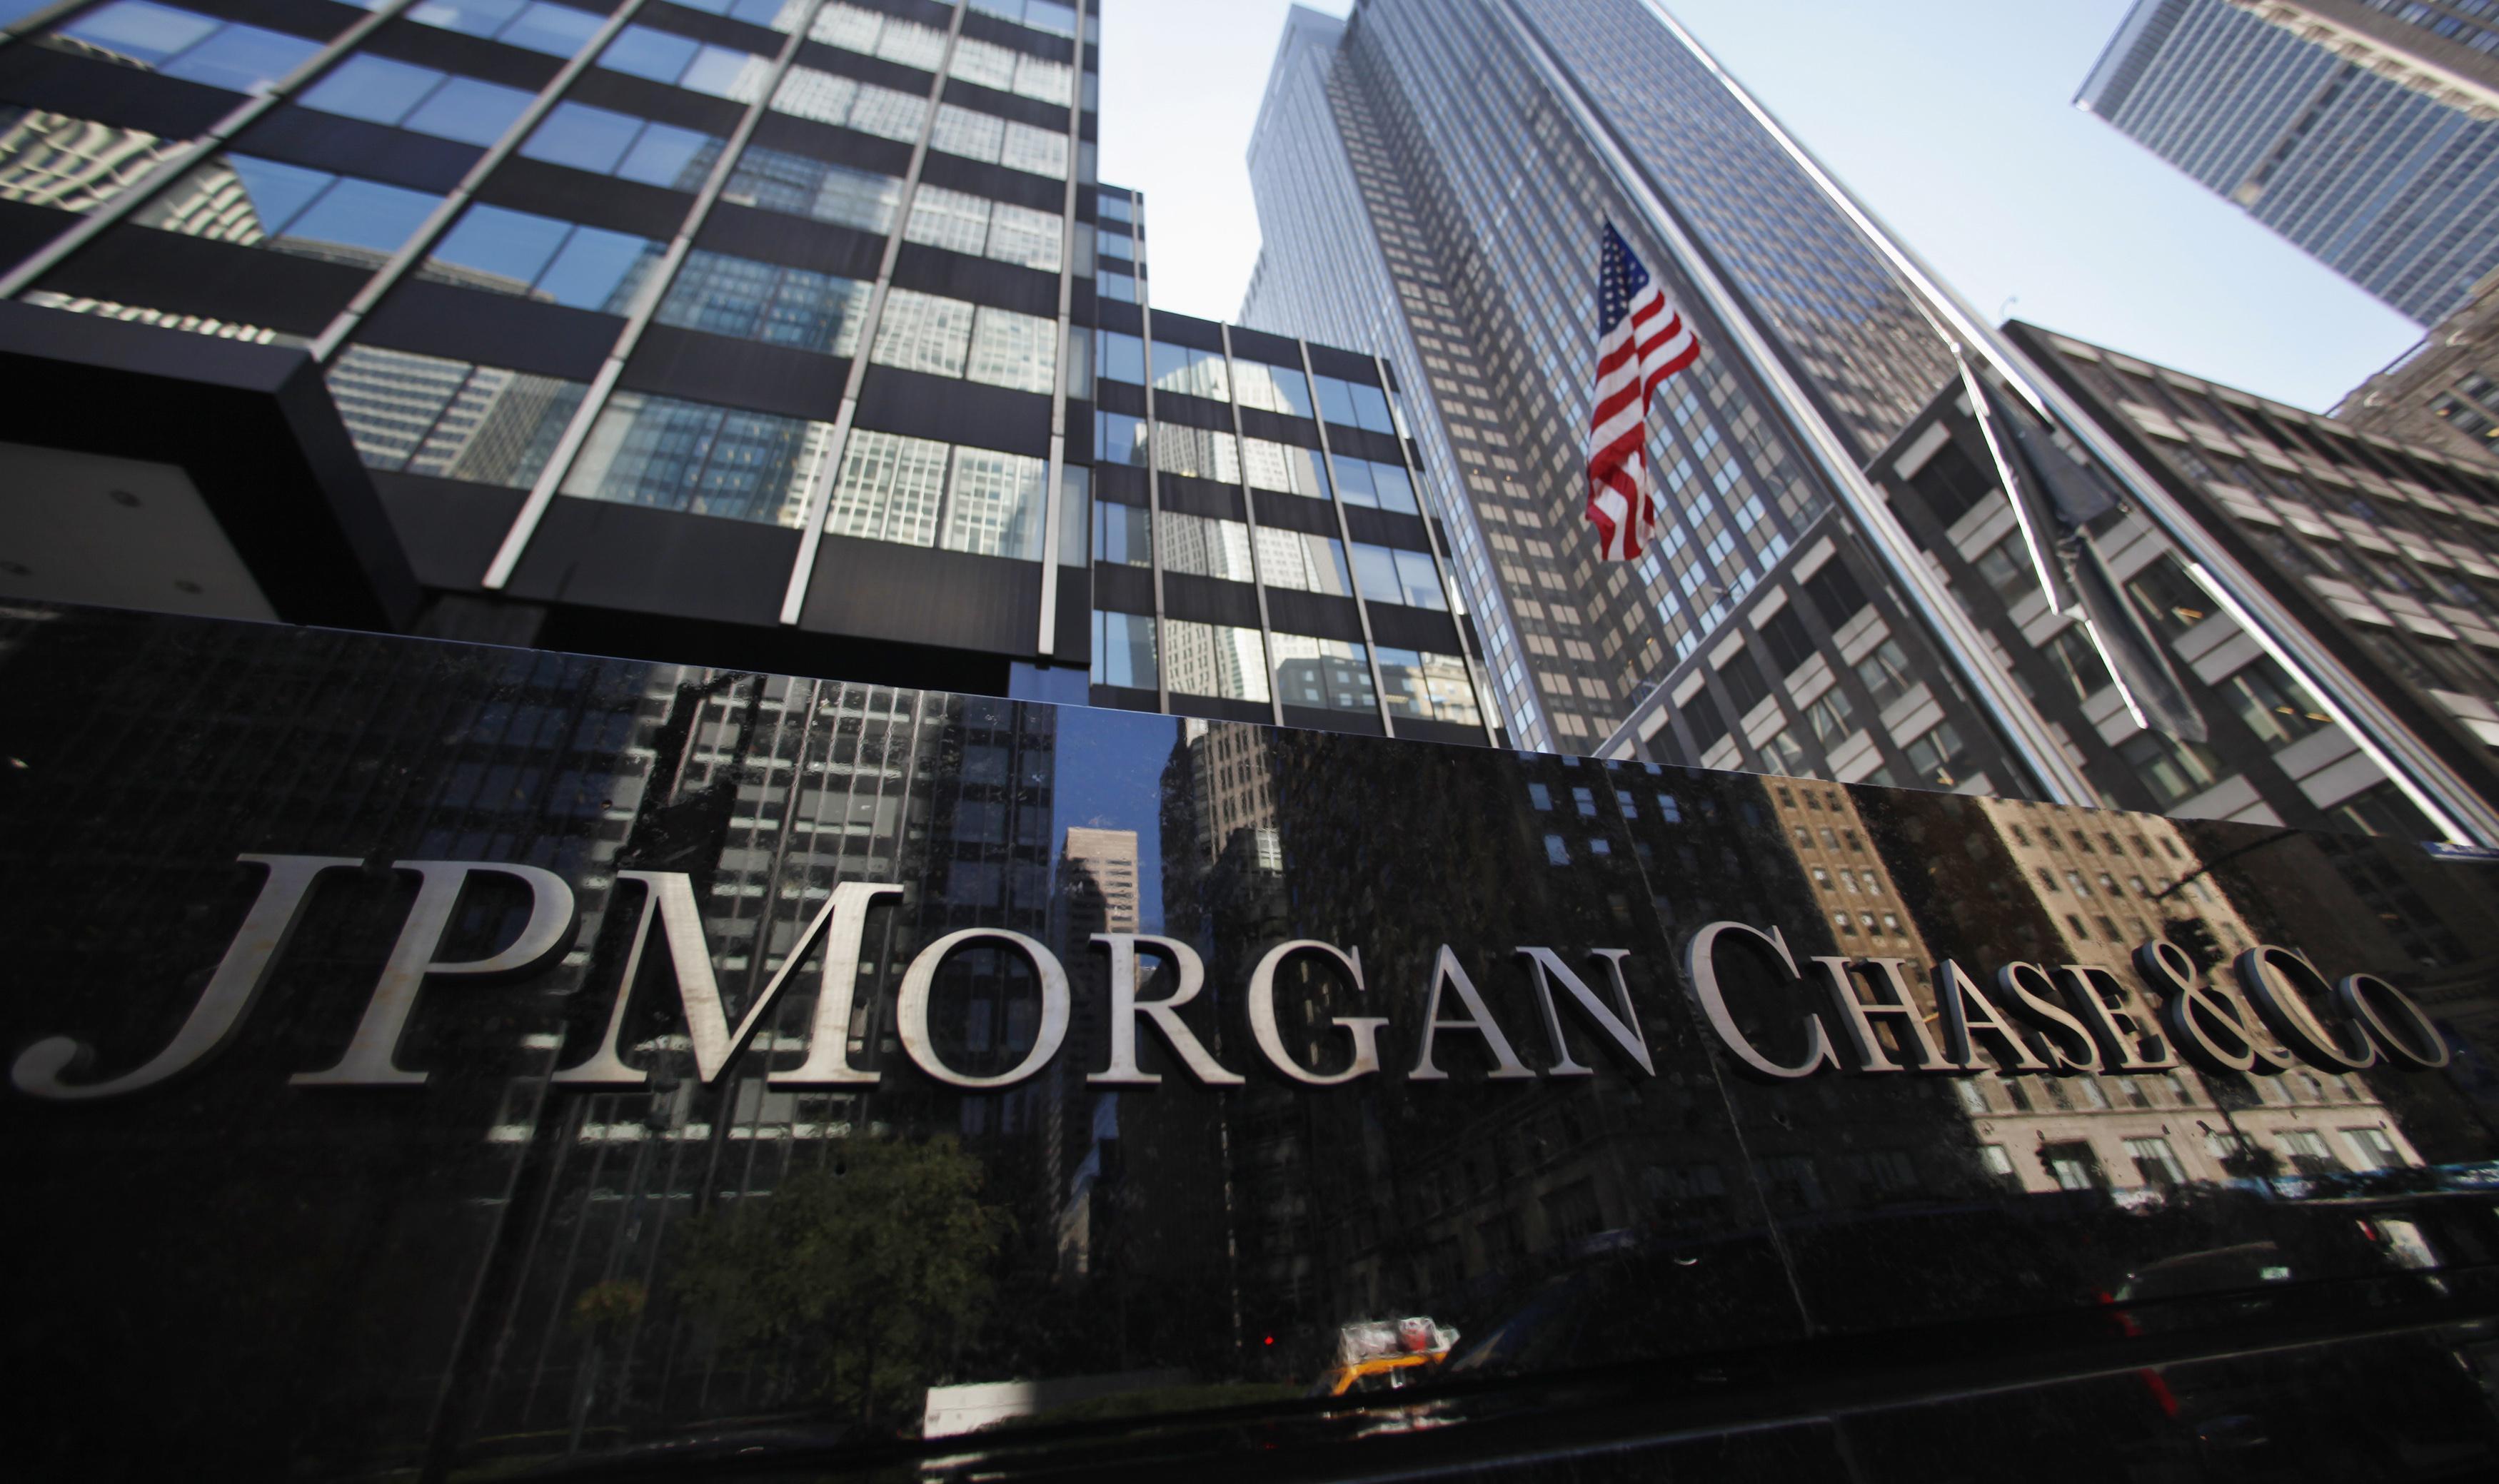 U.S. bank executives offer cautious optimism heading into 2020